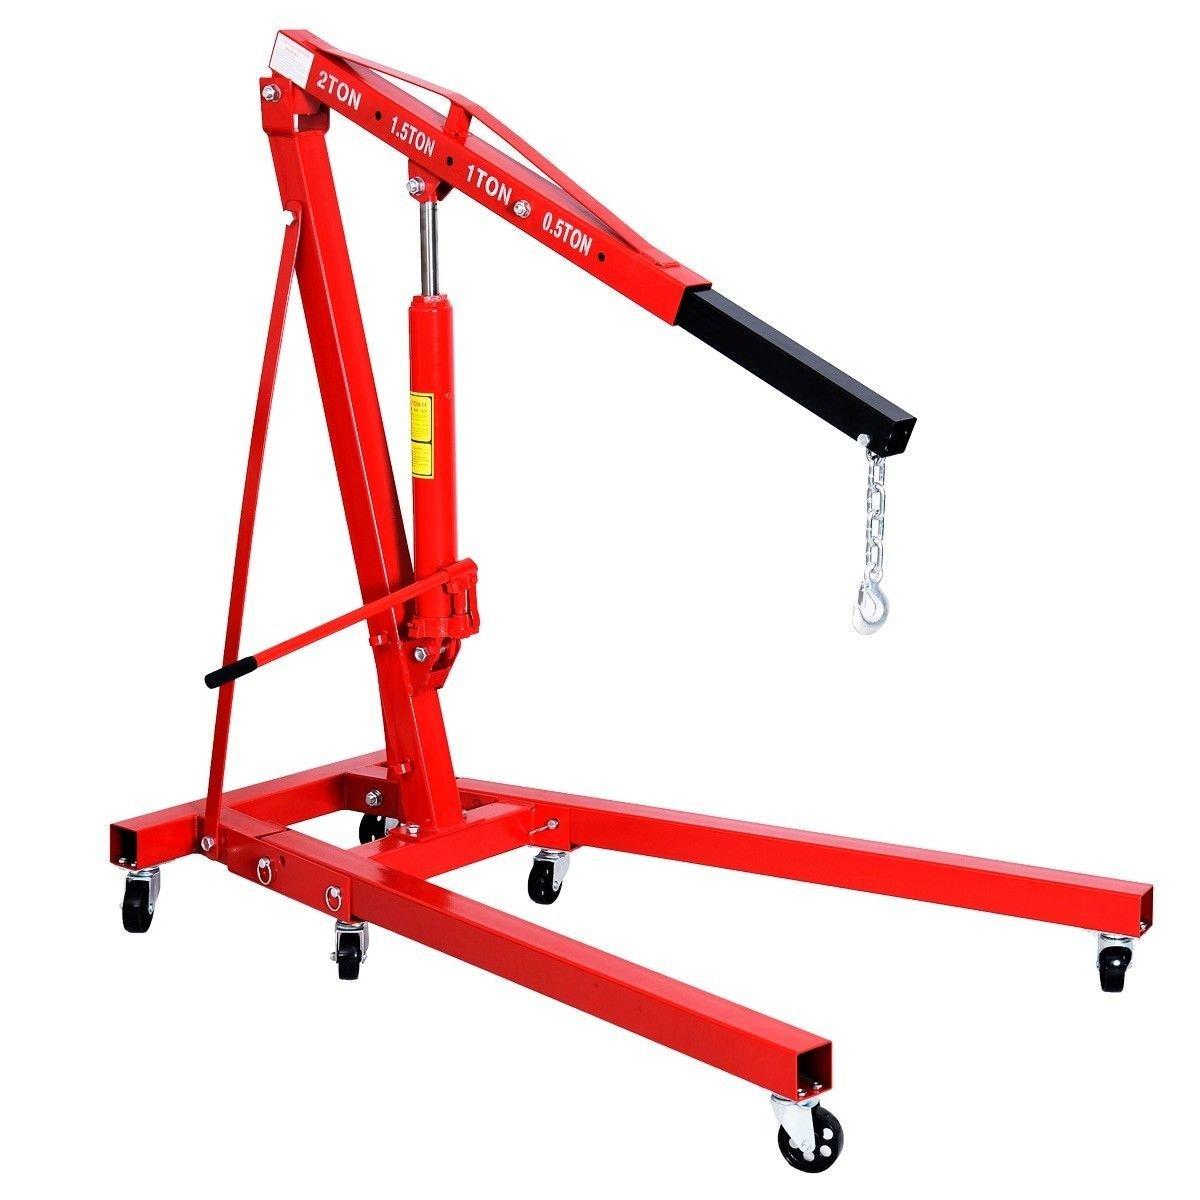 2 TON Red Color Engine Motor Hoist Cherry Picker Shop Crane Lift